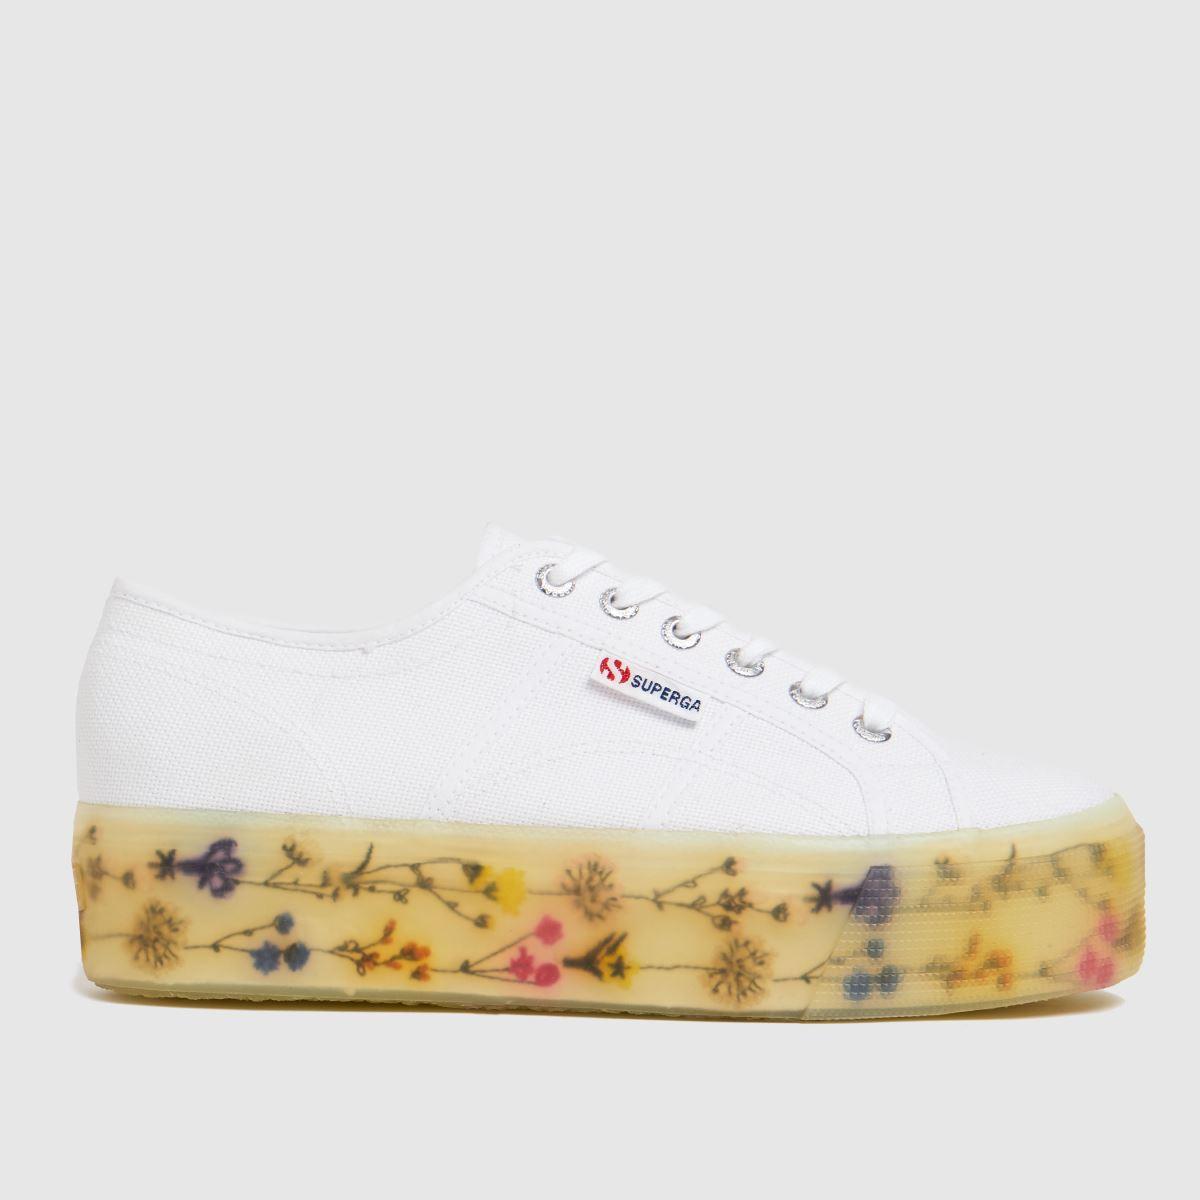 Superga White 2790 Jellygum Flower Bloom Trainers